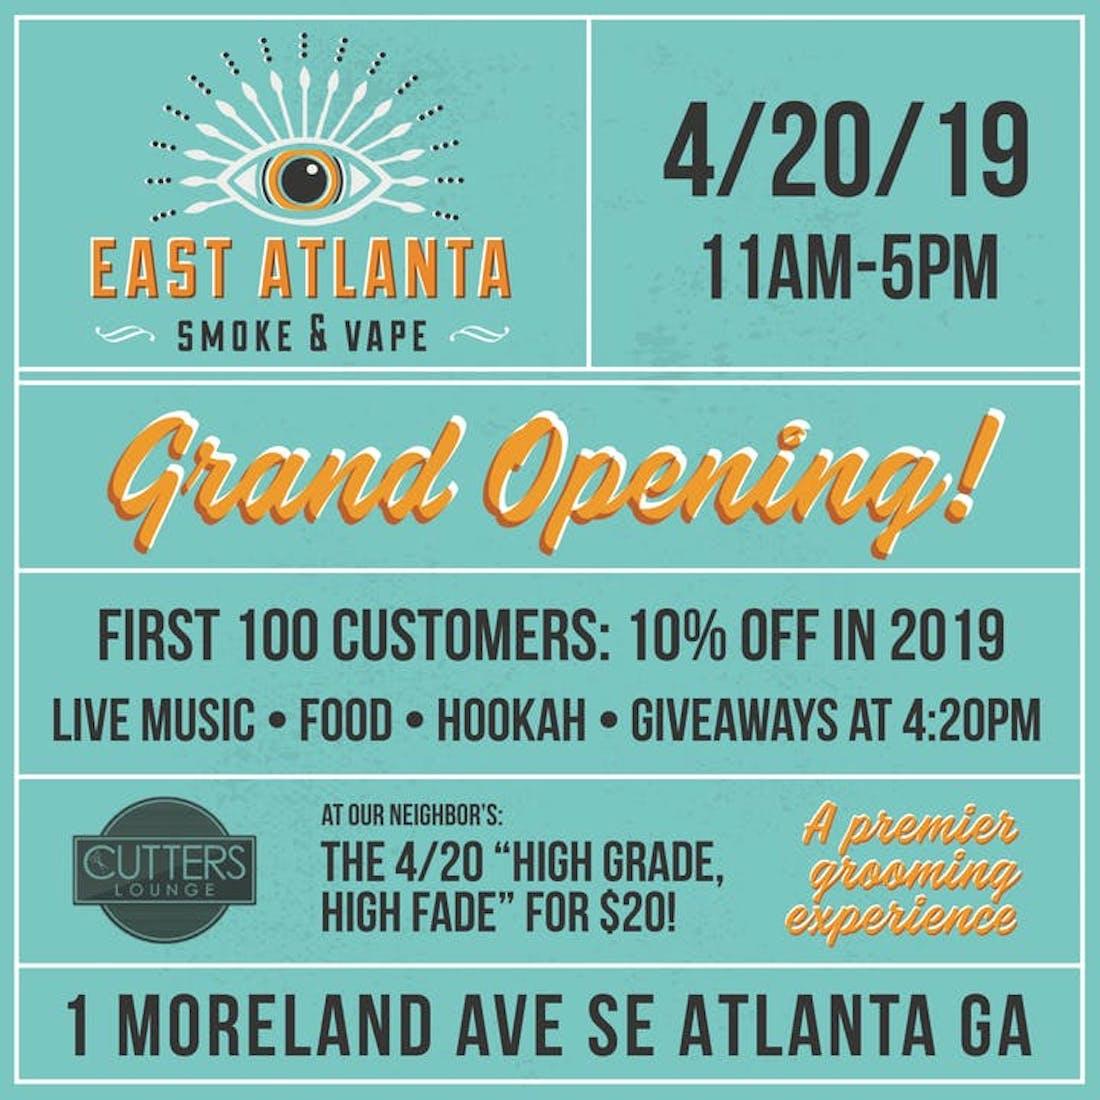 East Atlanta Smoke and Vape Reynoldstown Grand Opening